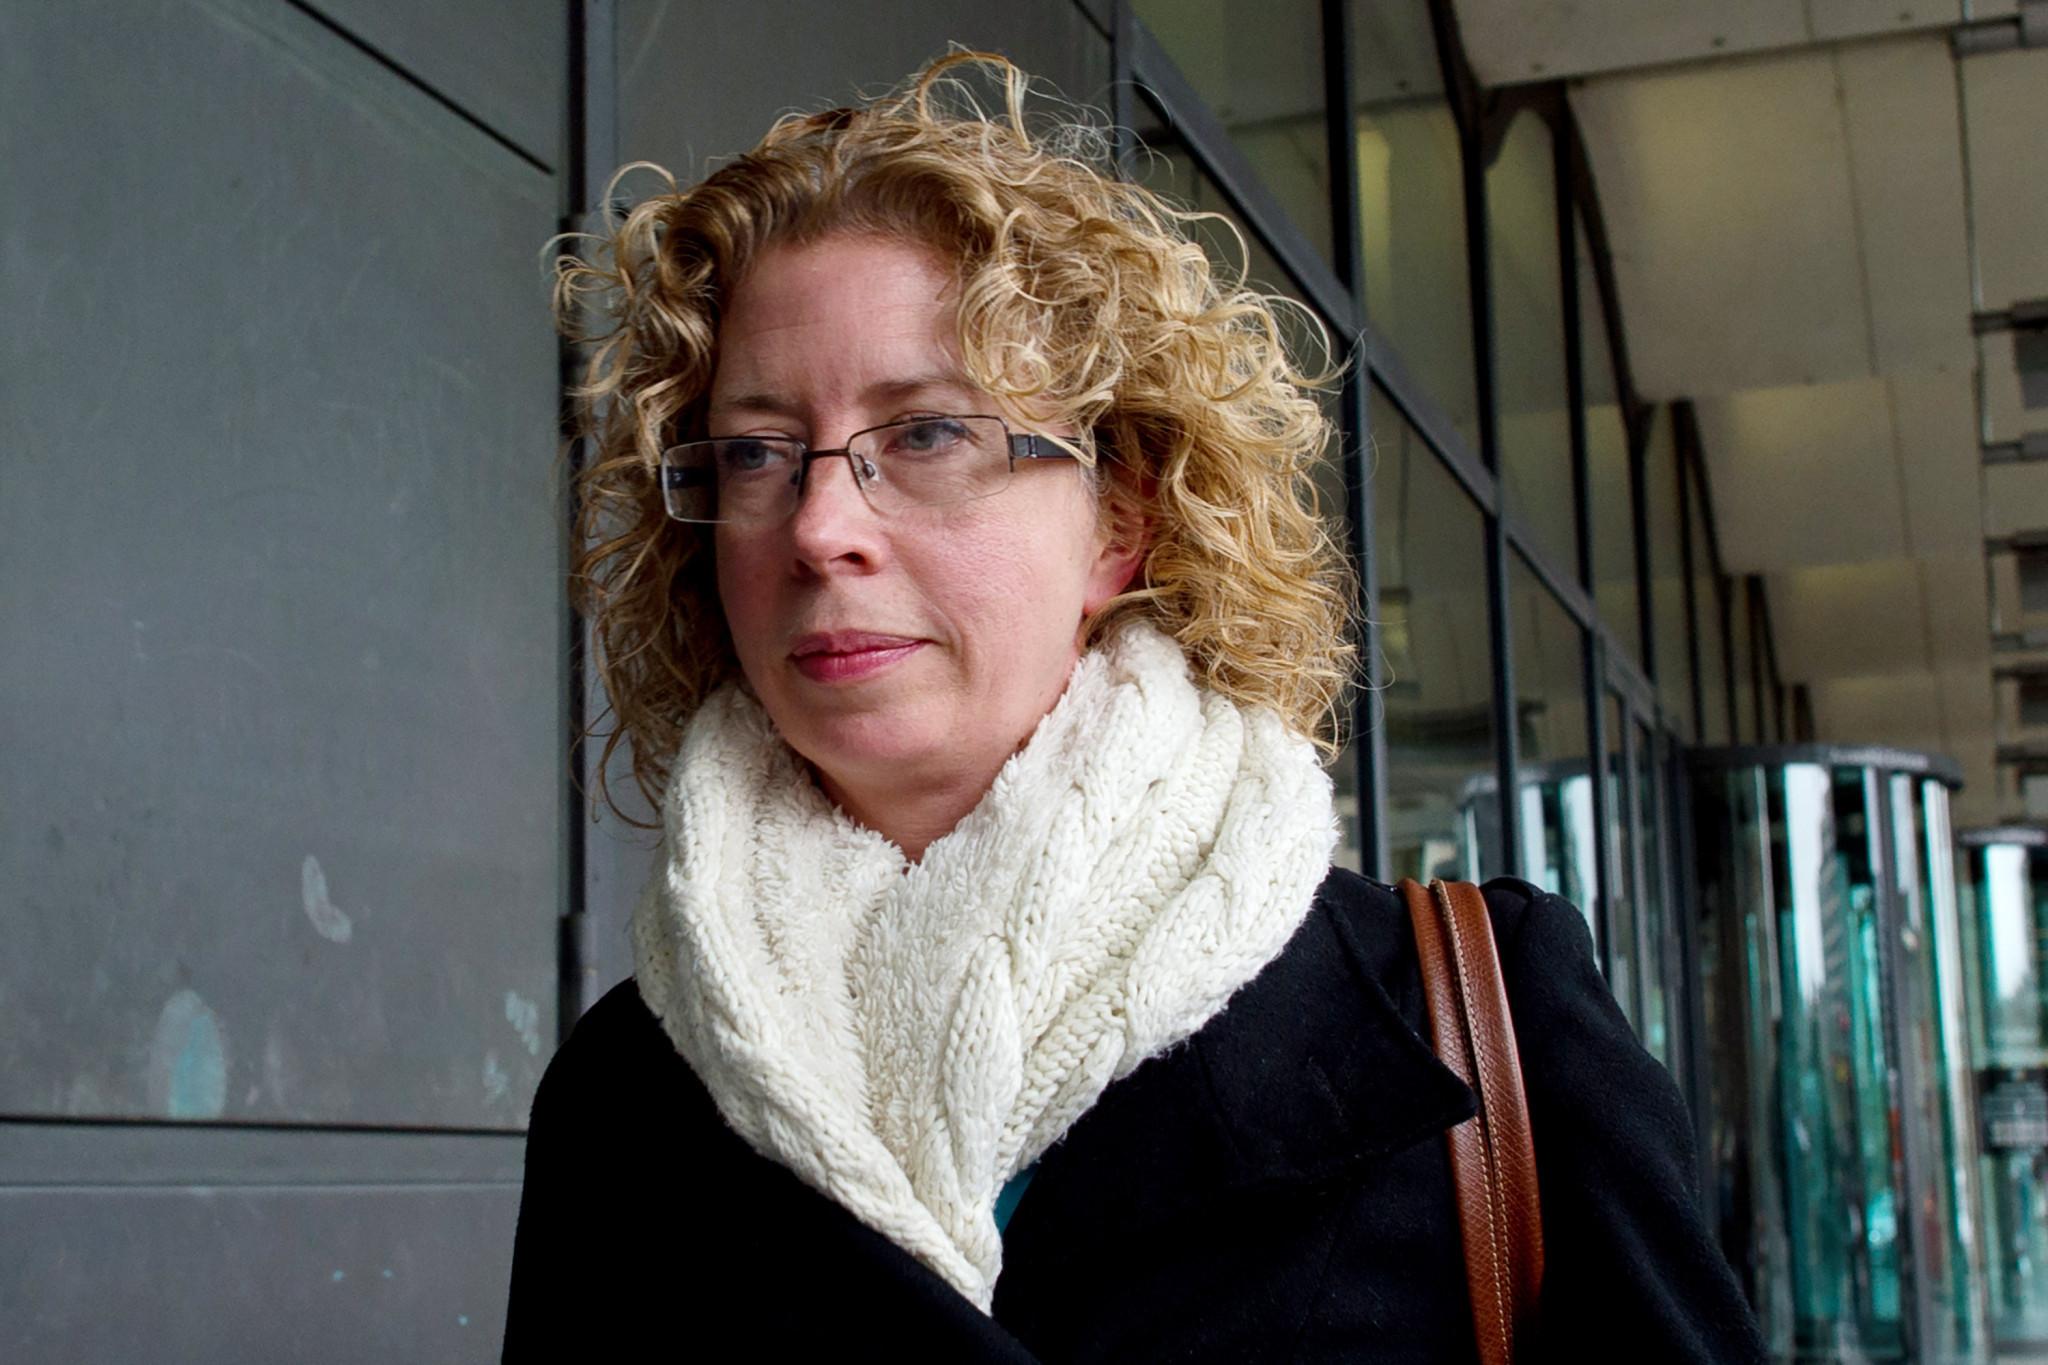 UKAD chief executive Nicole Sapstead stated it was a